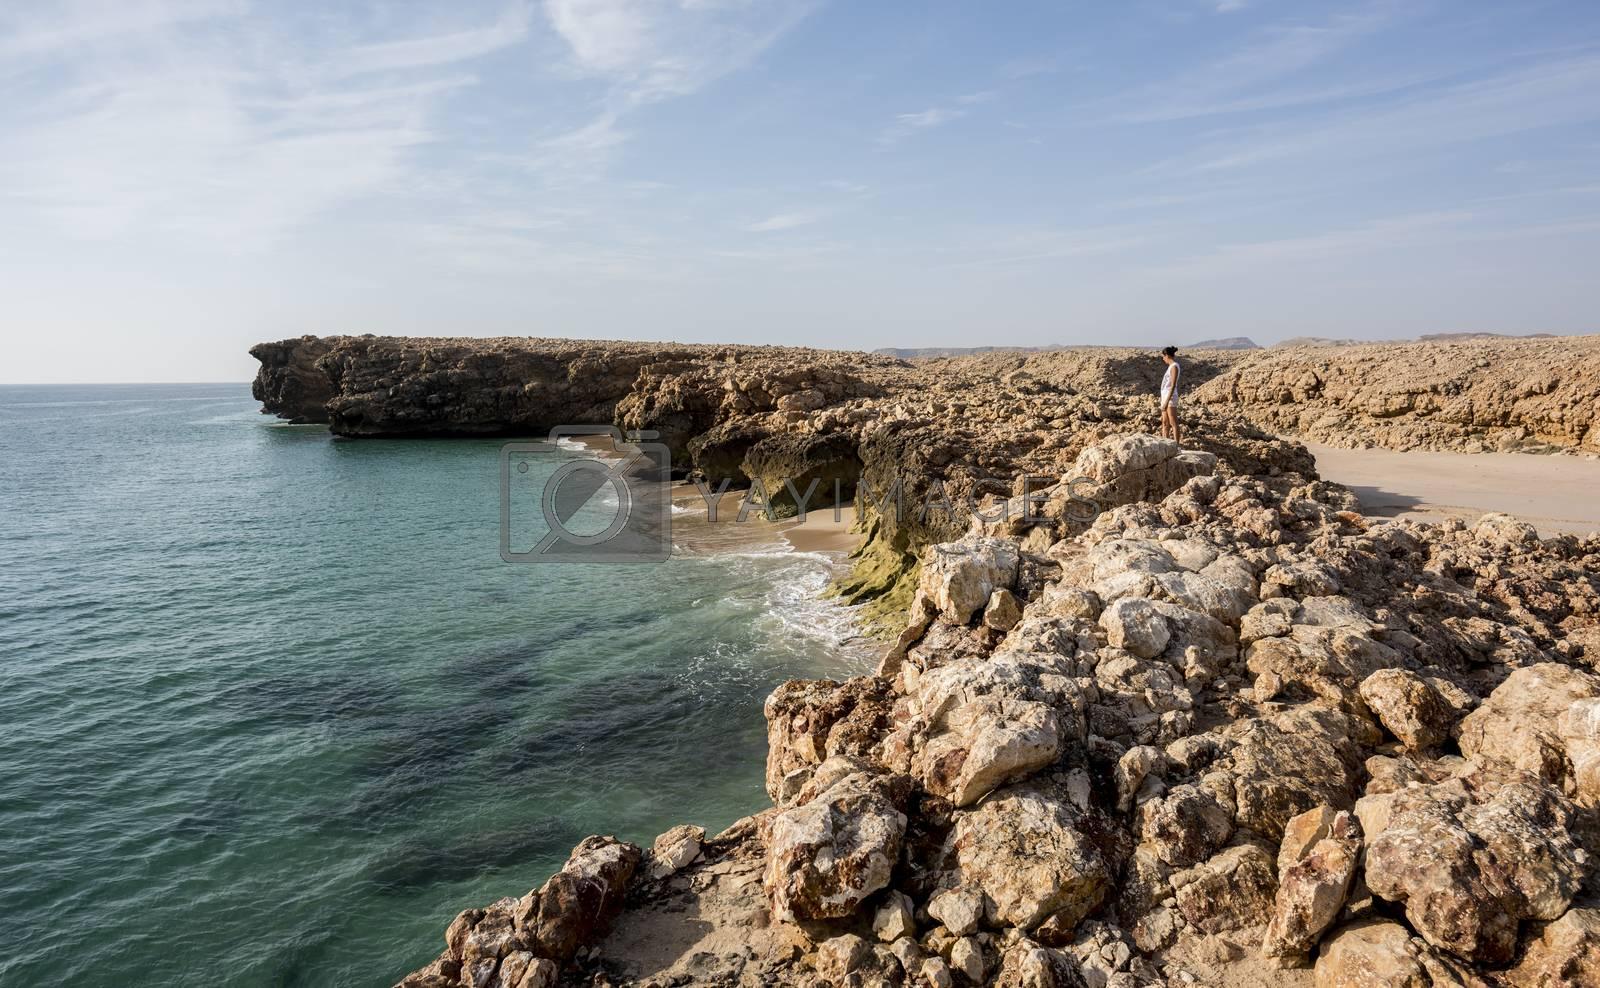 Woman admiring the wild coast of Ras Al Jinz with a sandy beach at her left, Oman